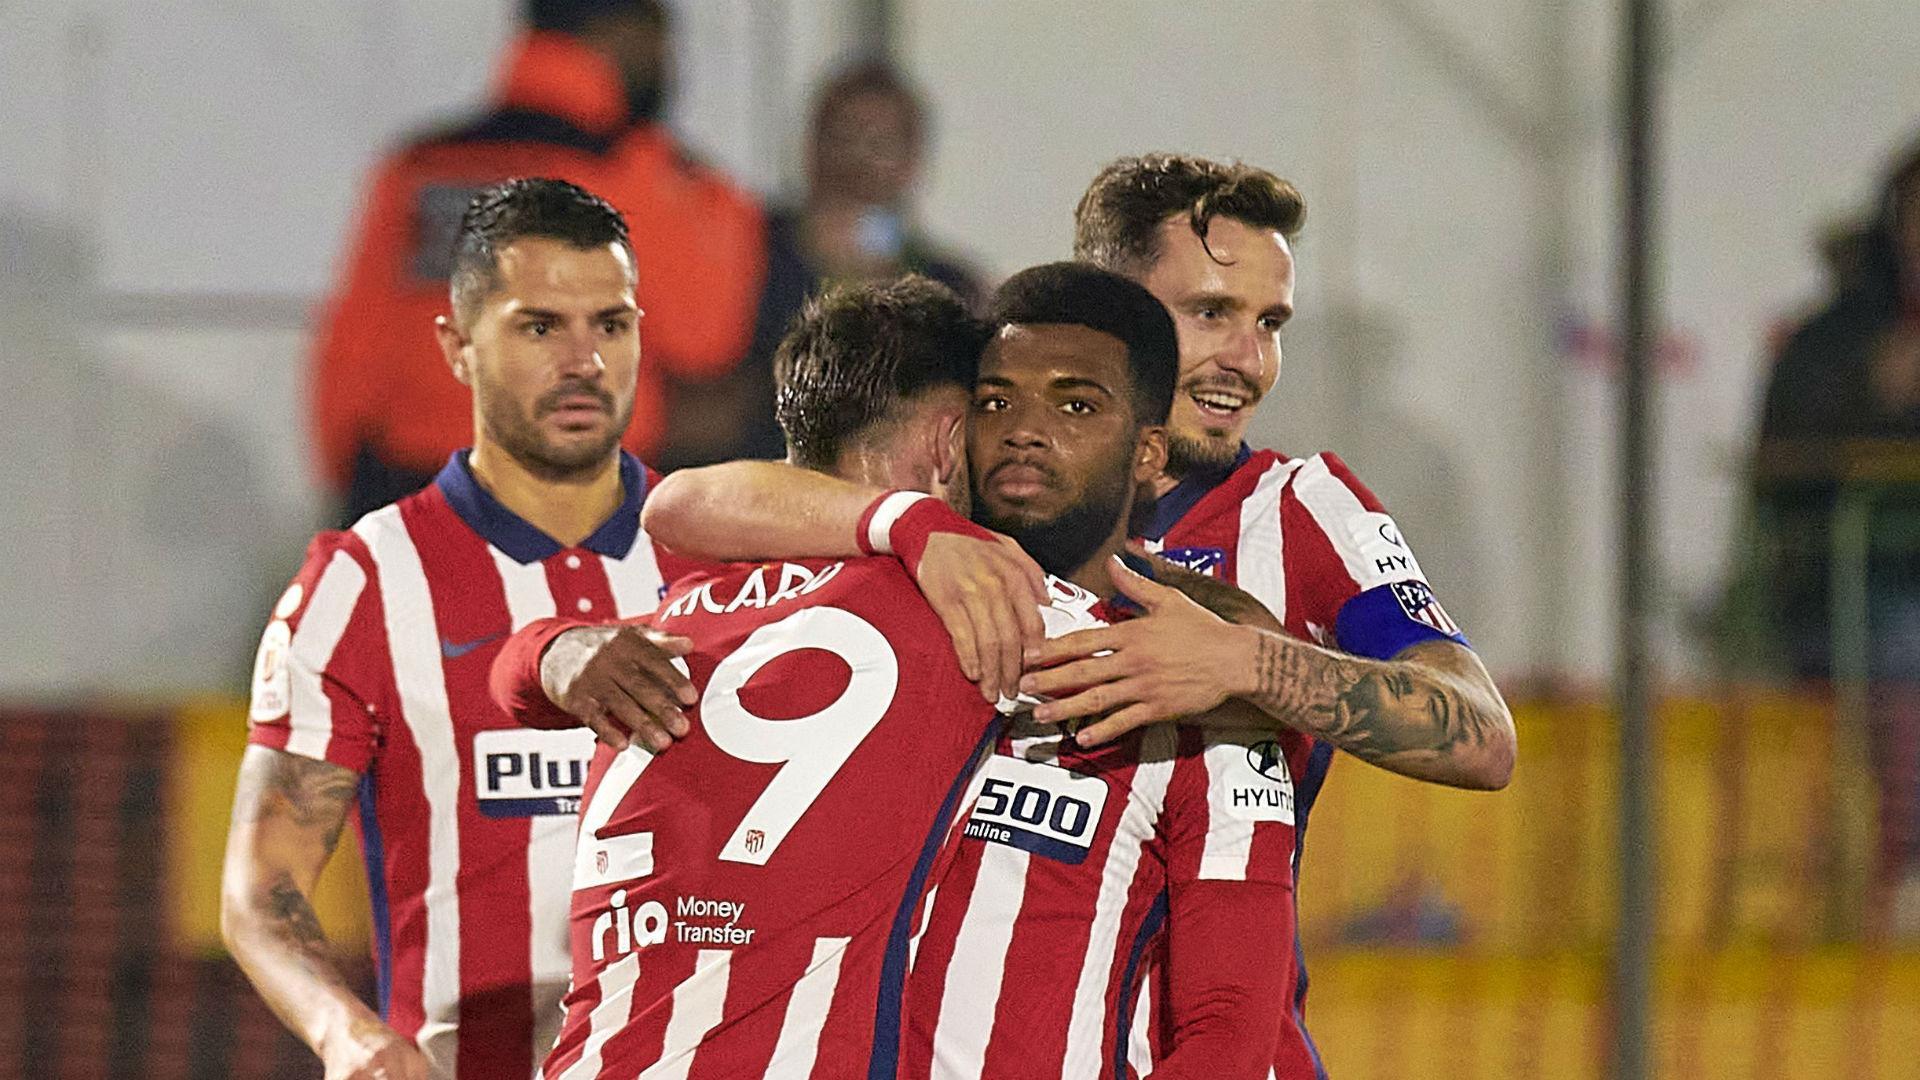 Cardassar 0-3 Atletico Madrid: Lemar leads the way as Simeone's team ease through